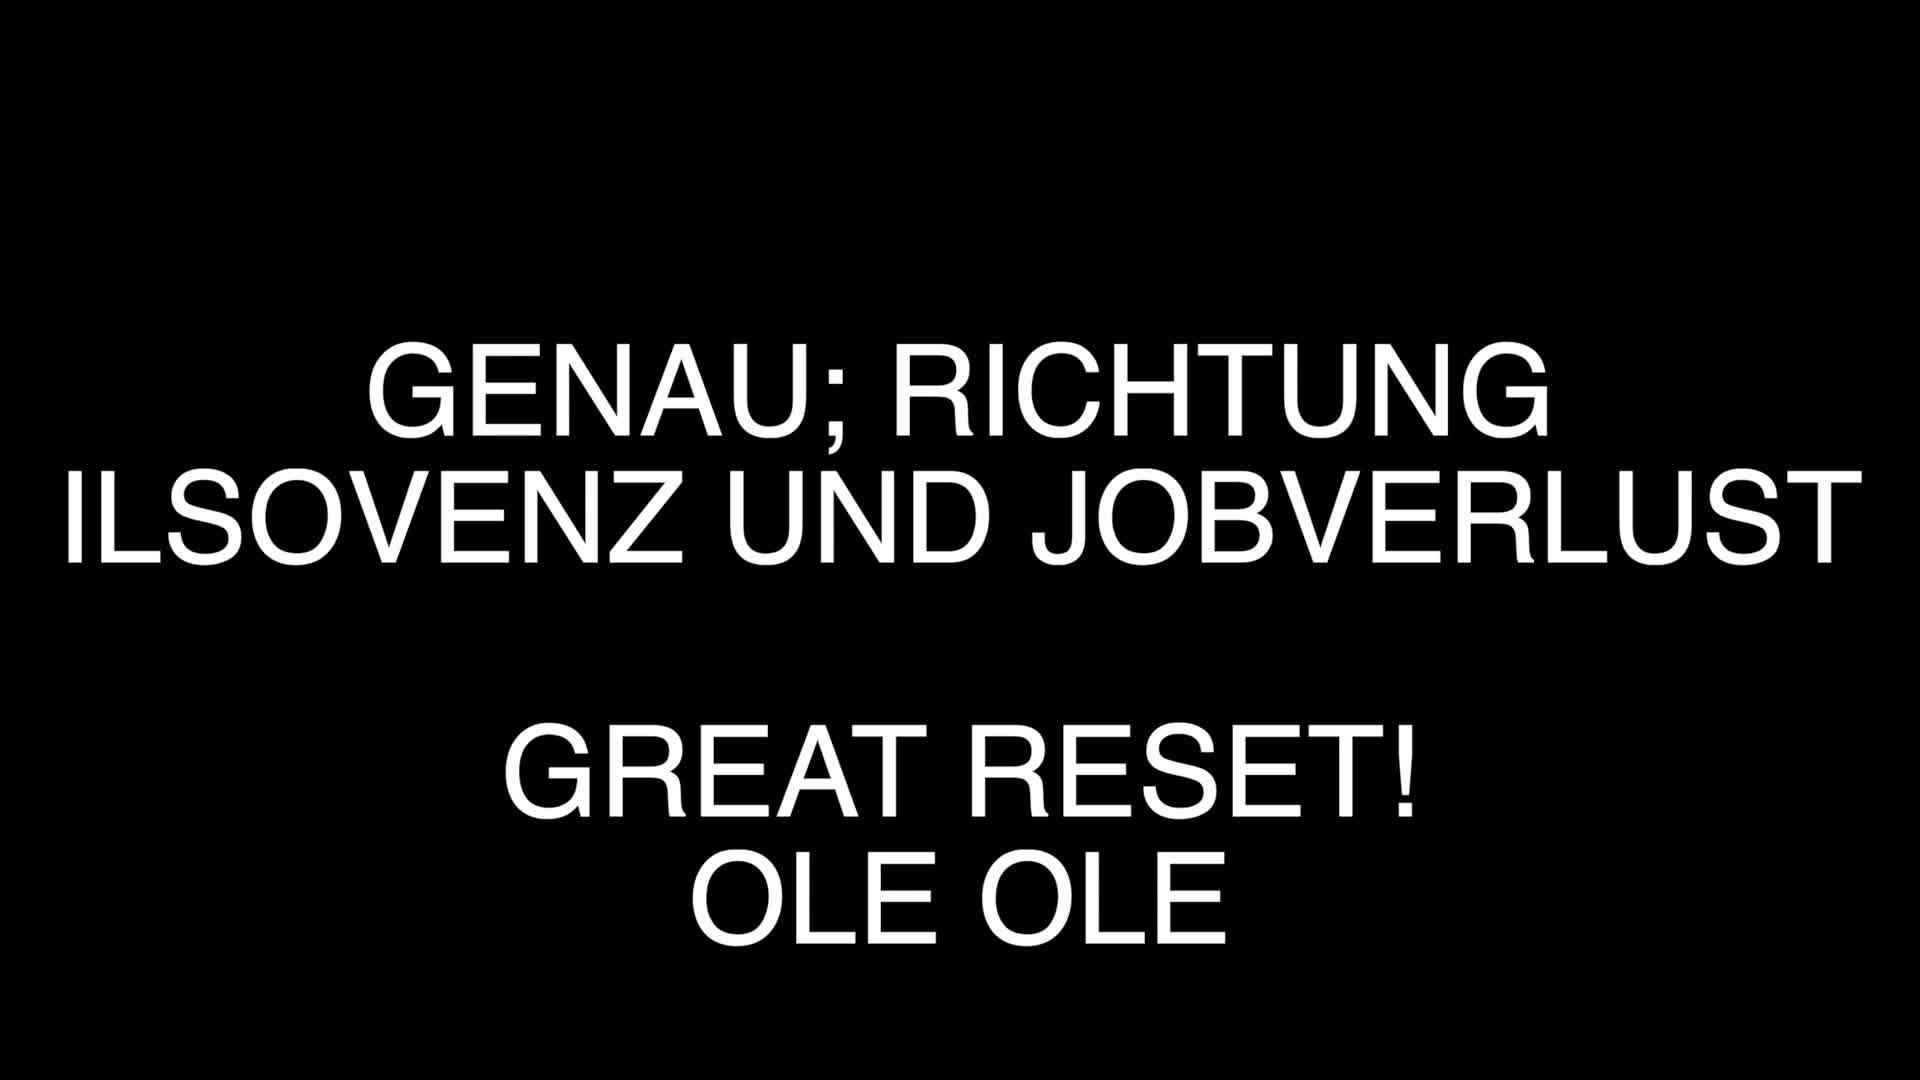 Rudi Rudi gibt acht! Der Rücktritt hats hoffentlich gebracht!